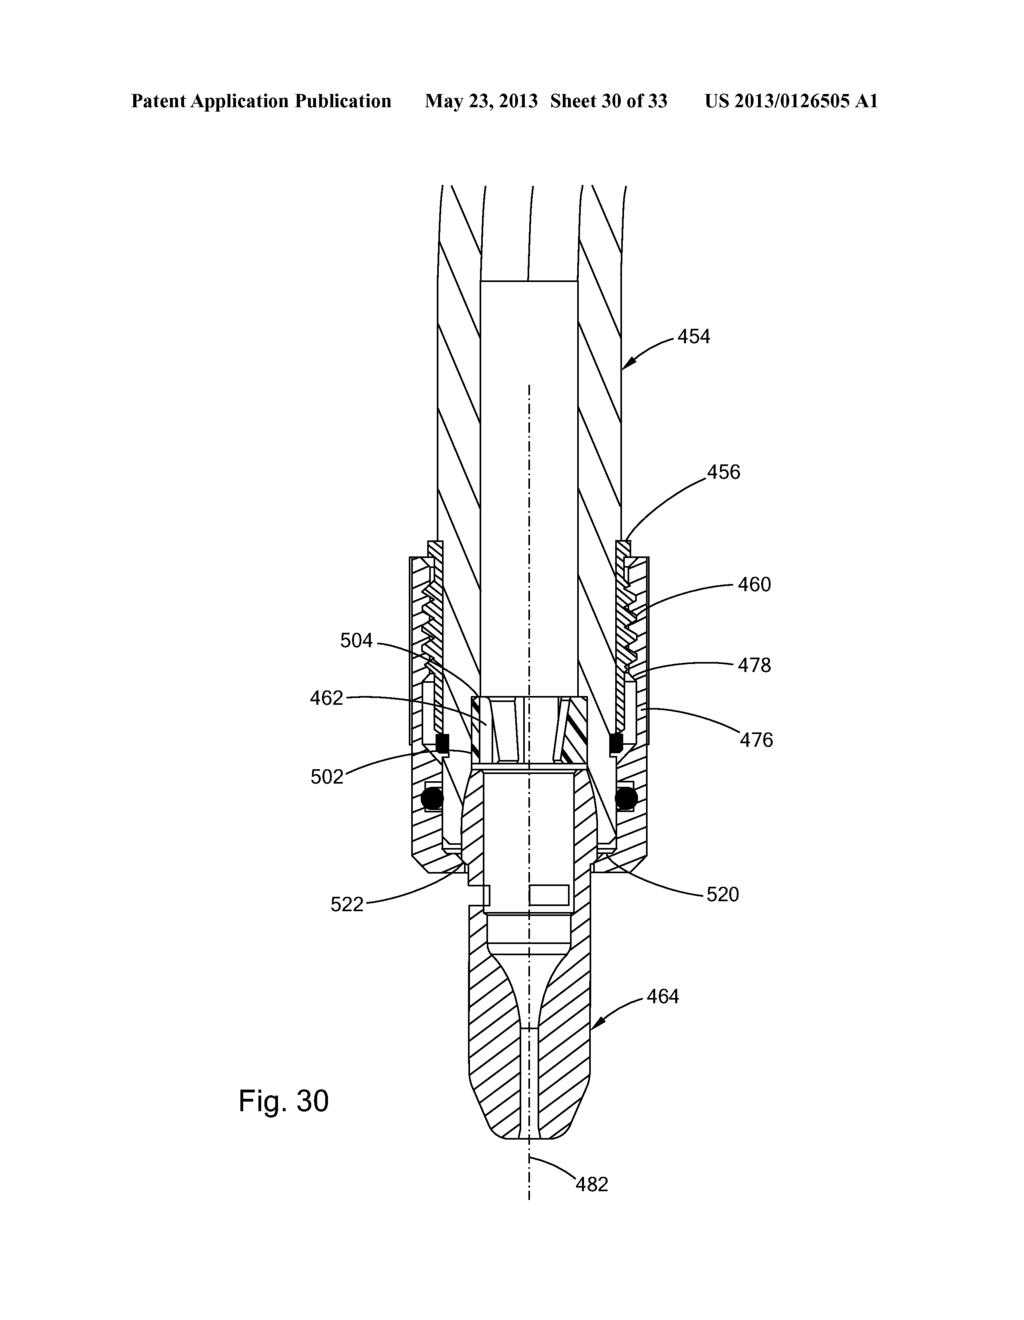 Mig Gun Diagram Detailed Schematics Hobart 250 Welder Wiring Centering Device For Conductor Tube Gmaw Manual Robotic Arc Beta